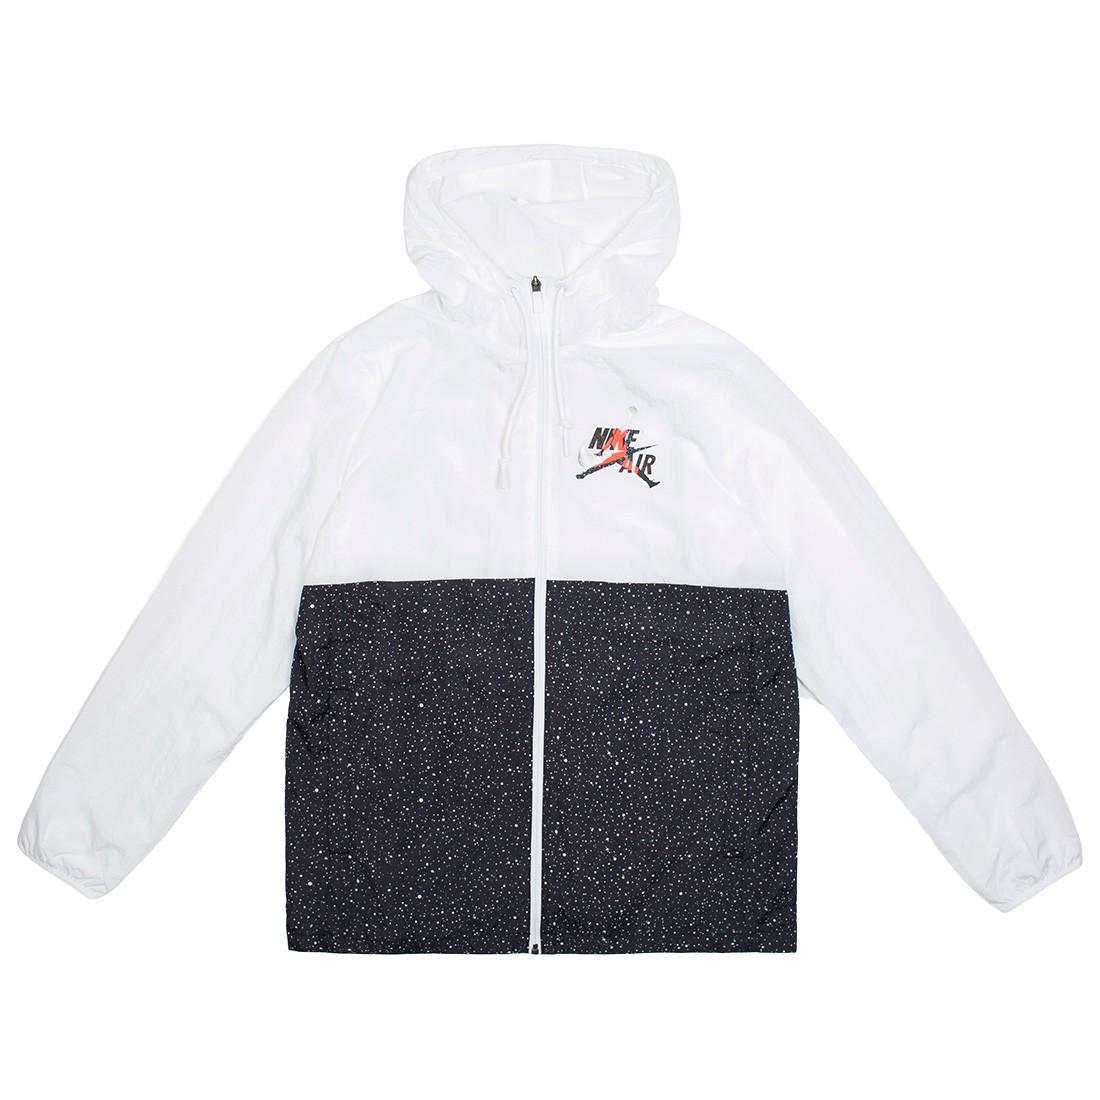 Jordan Men Jumpman Classics Jacket (white / black / infrared 23 / metallic silver)